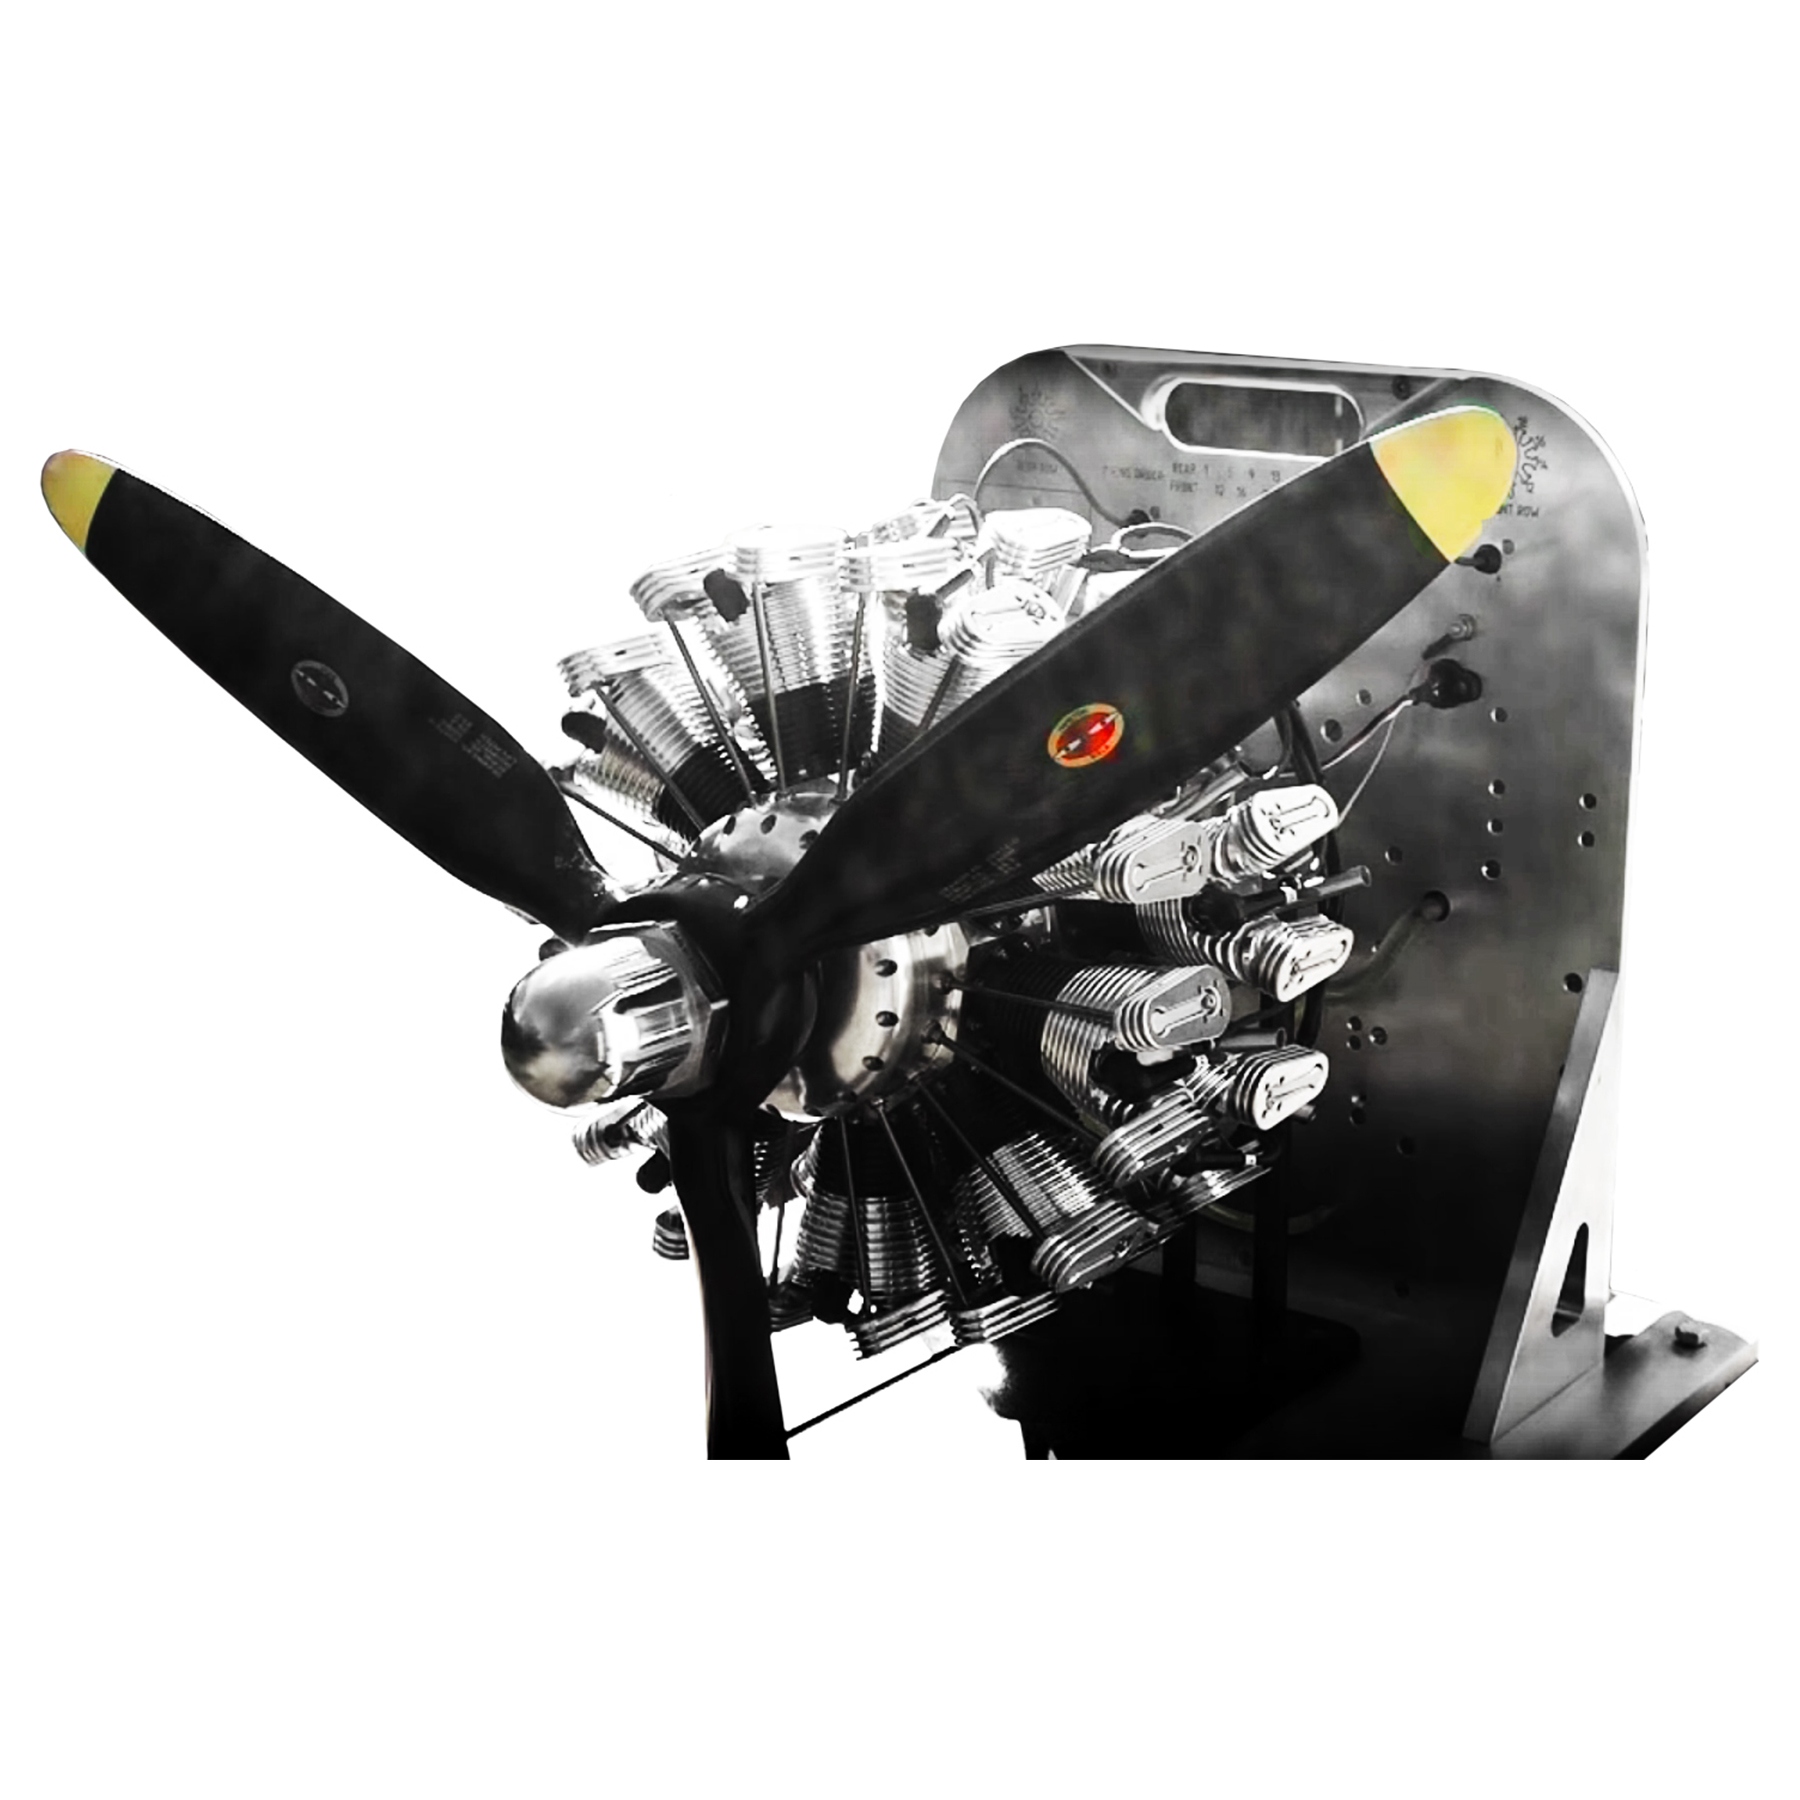 19-cyl-mini-airplane-engine